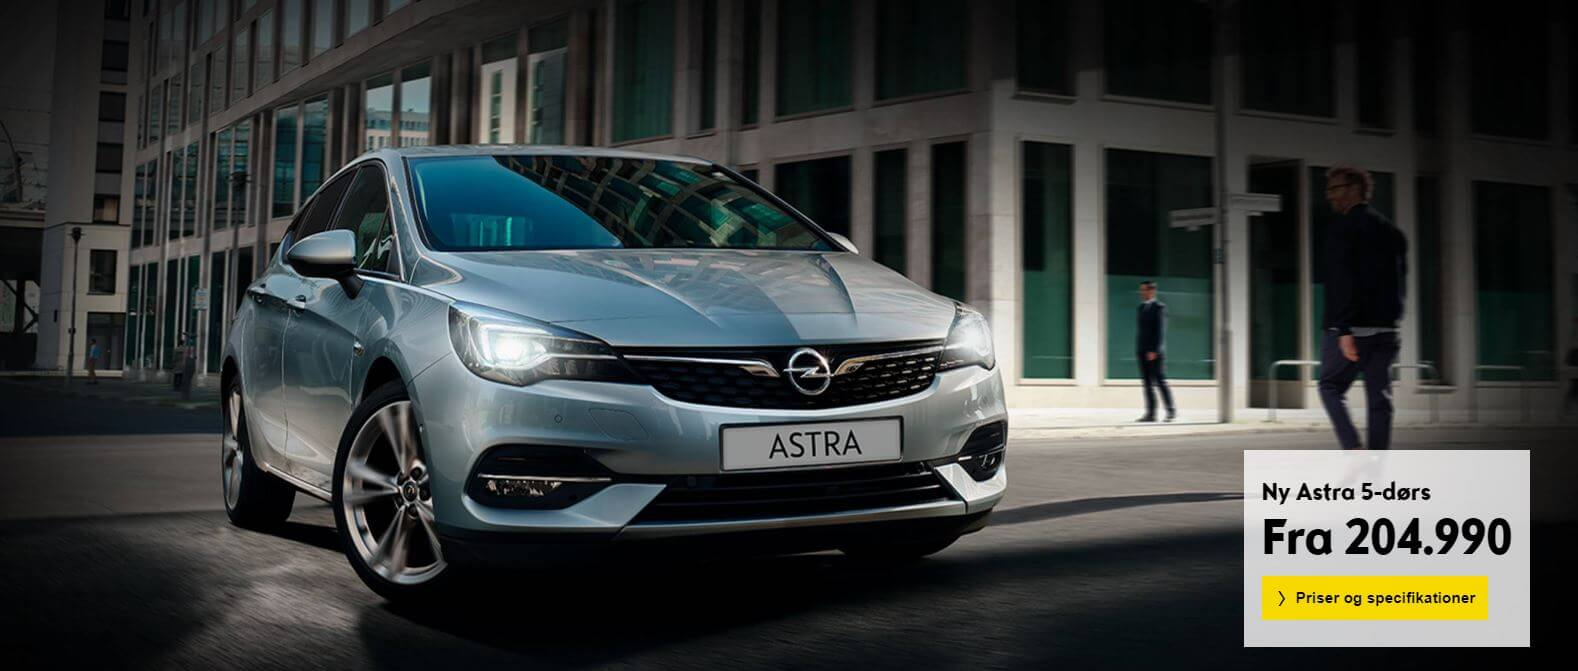 Uggerhøj Opel astra kampagne